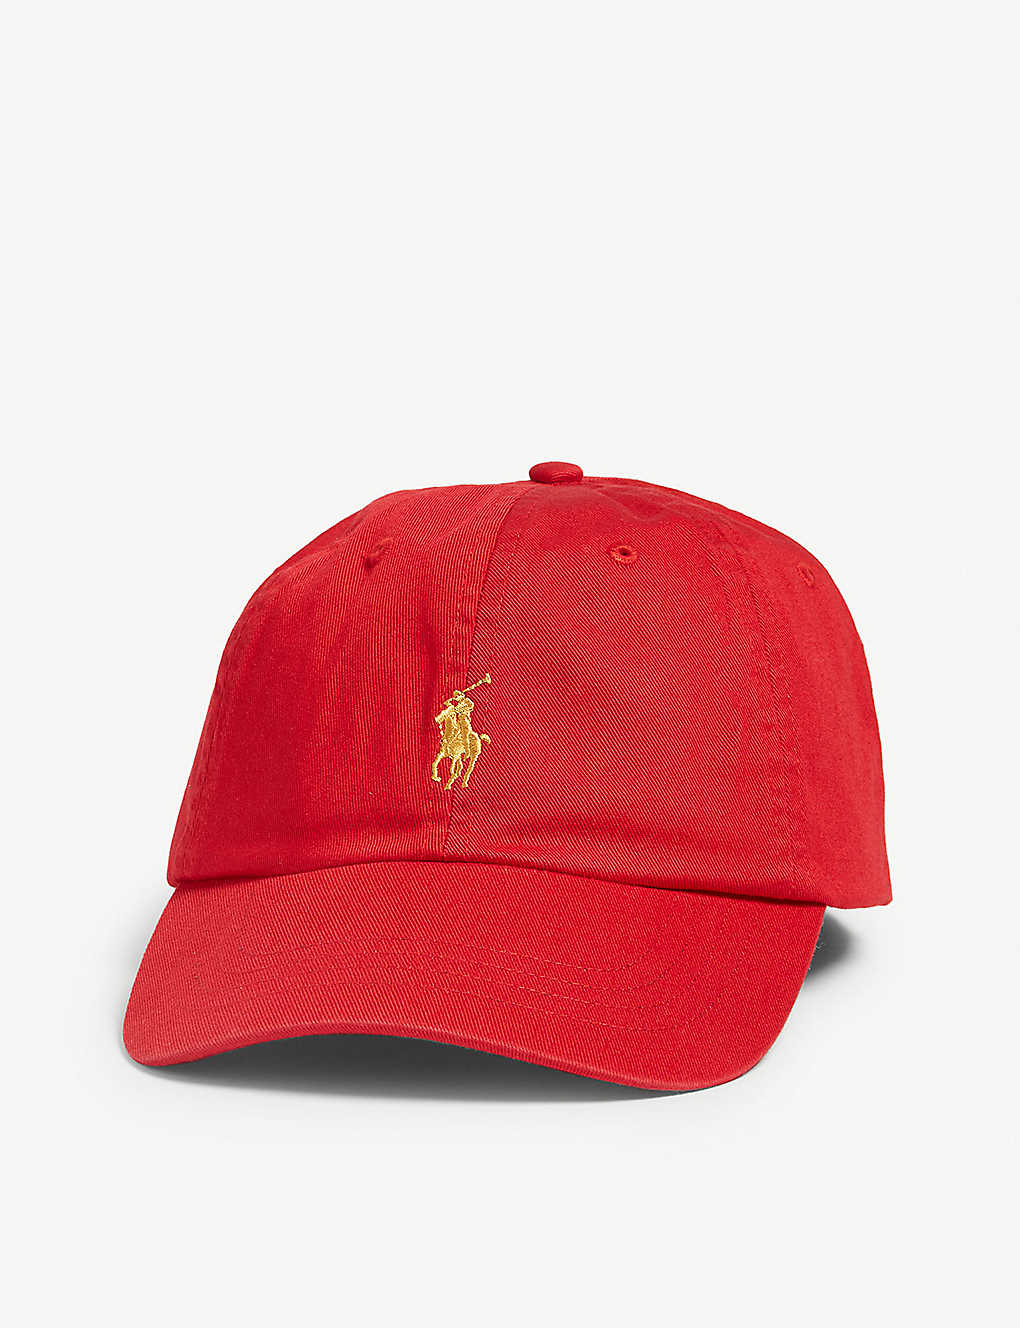 61fabd130c31b POLO RALPH LAUREN - Logo-embroidered cotton baseball cap ...